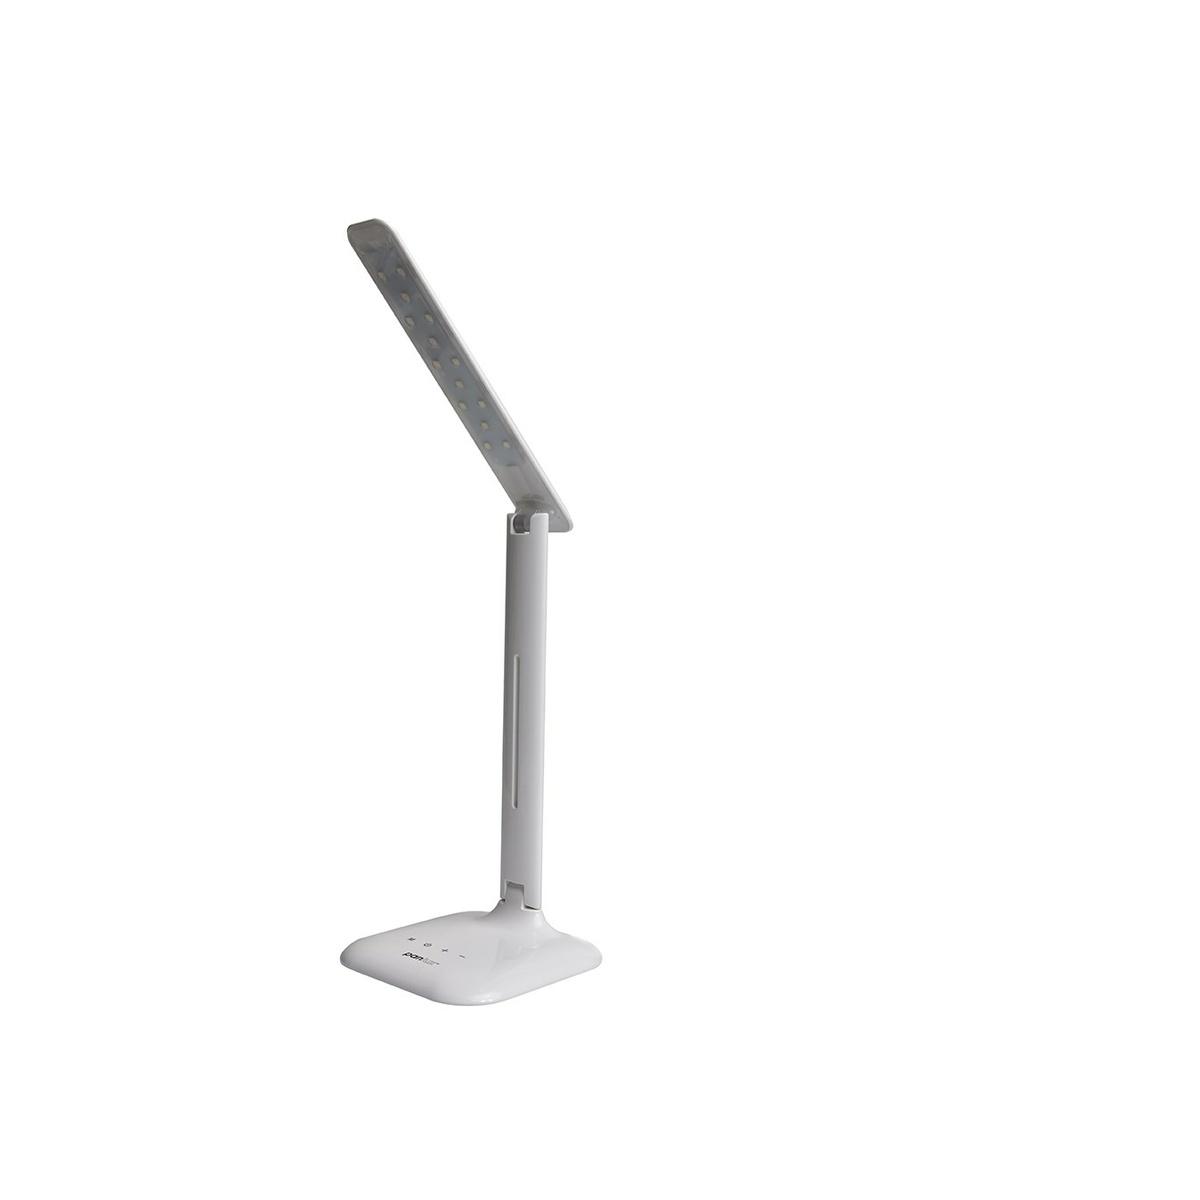 ROBIN LED stolná lampička, biela, Panlux